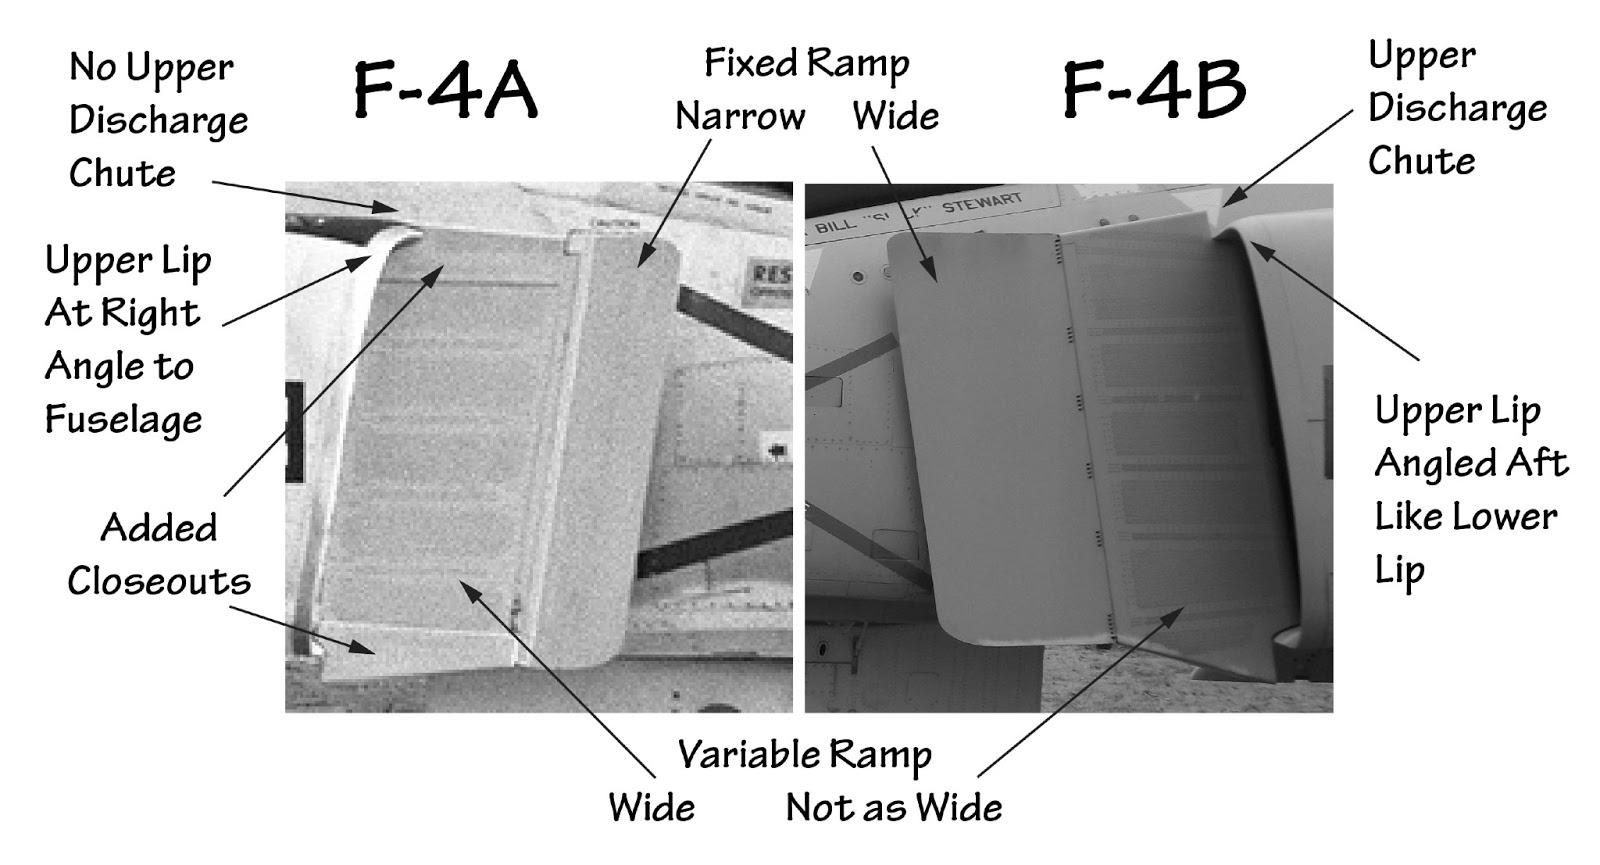 F-4A+vs+F-4B+Inlet+Rev+A.jpg